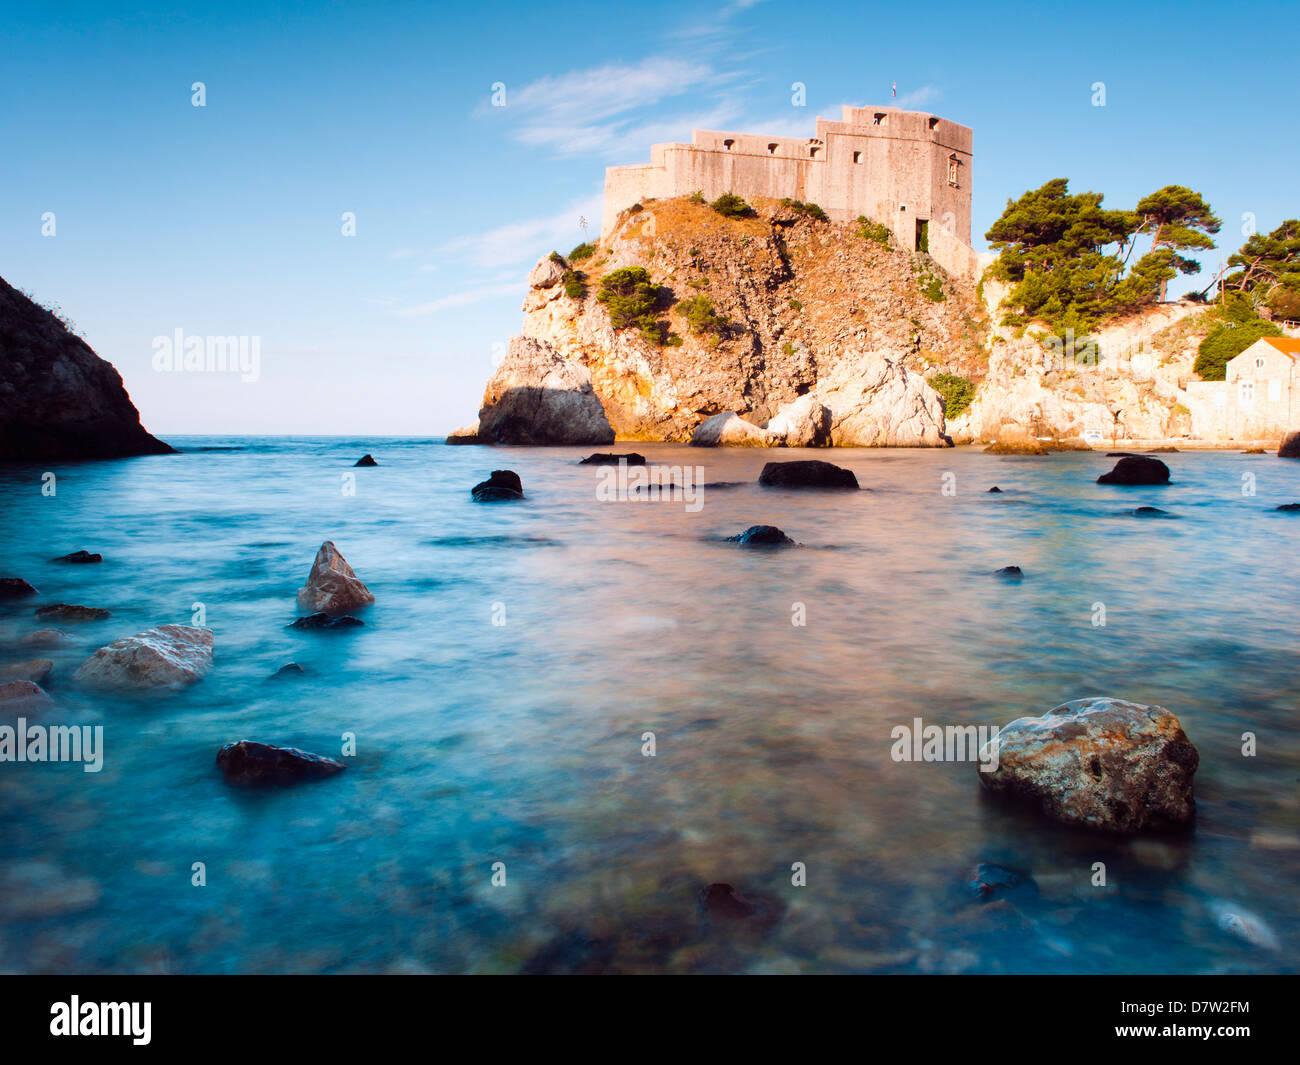 Fort Lovrijenac (St. Lawrence Fortress) at sunrise, Dubrovnik, Dalmatian Coast, Adriatic, Croatia - Stock Image